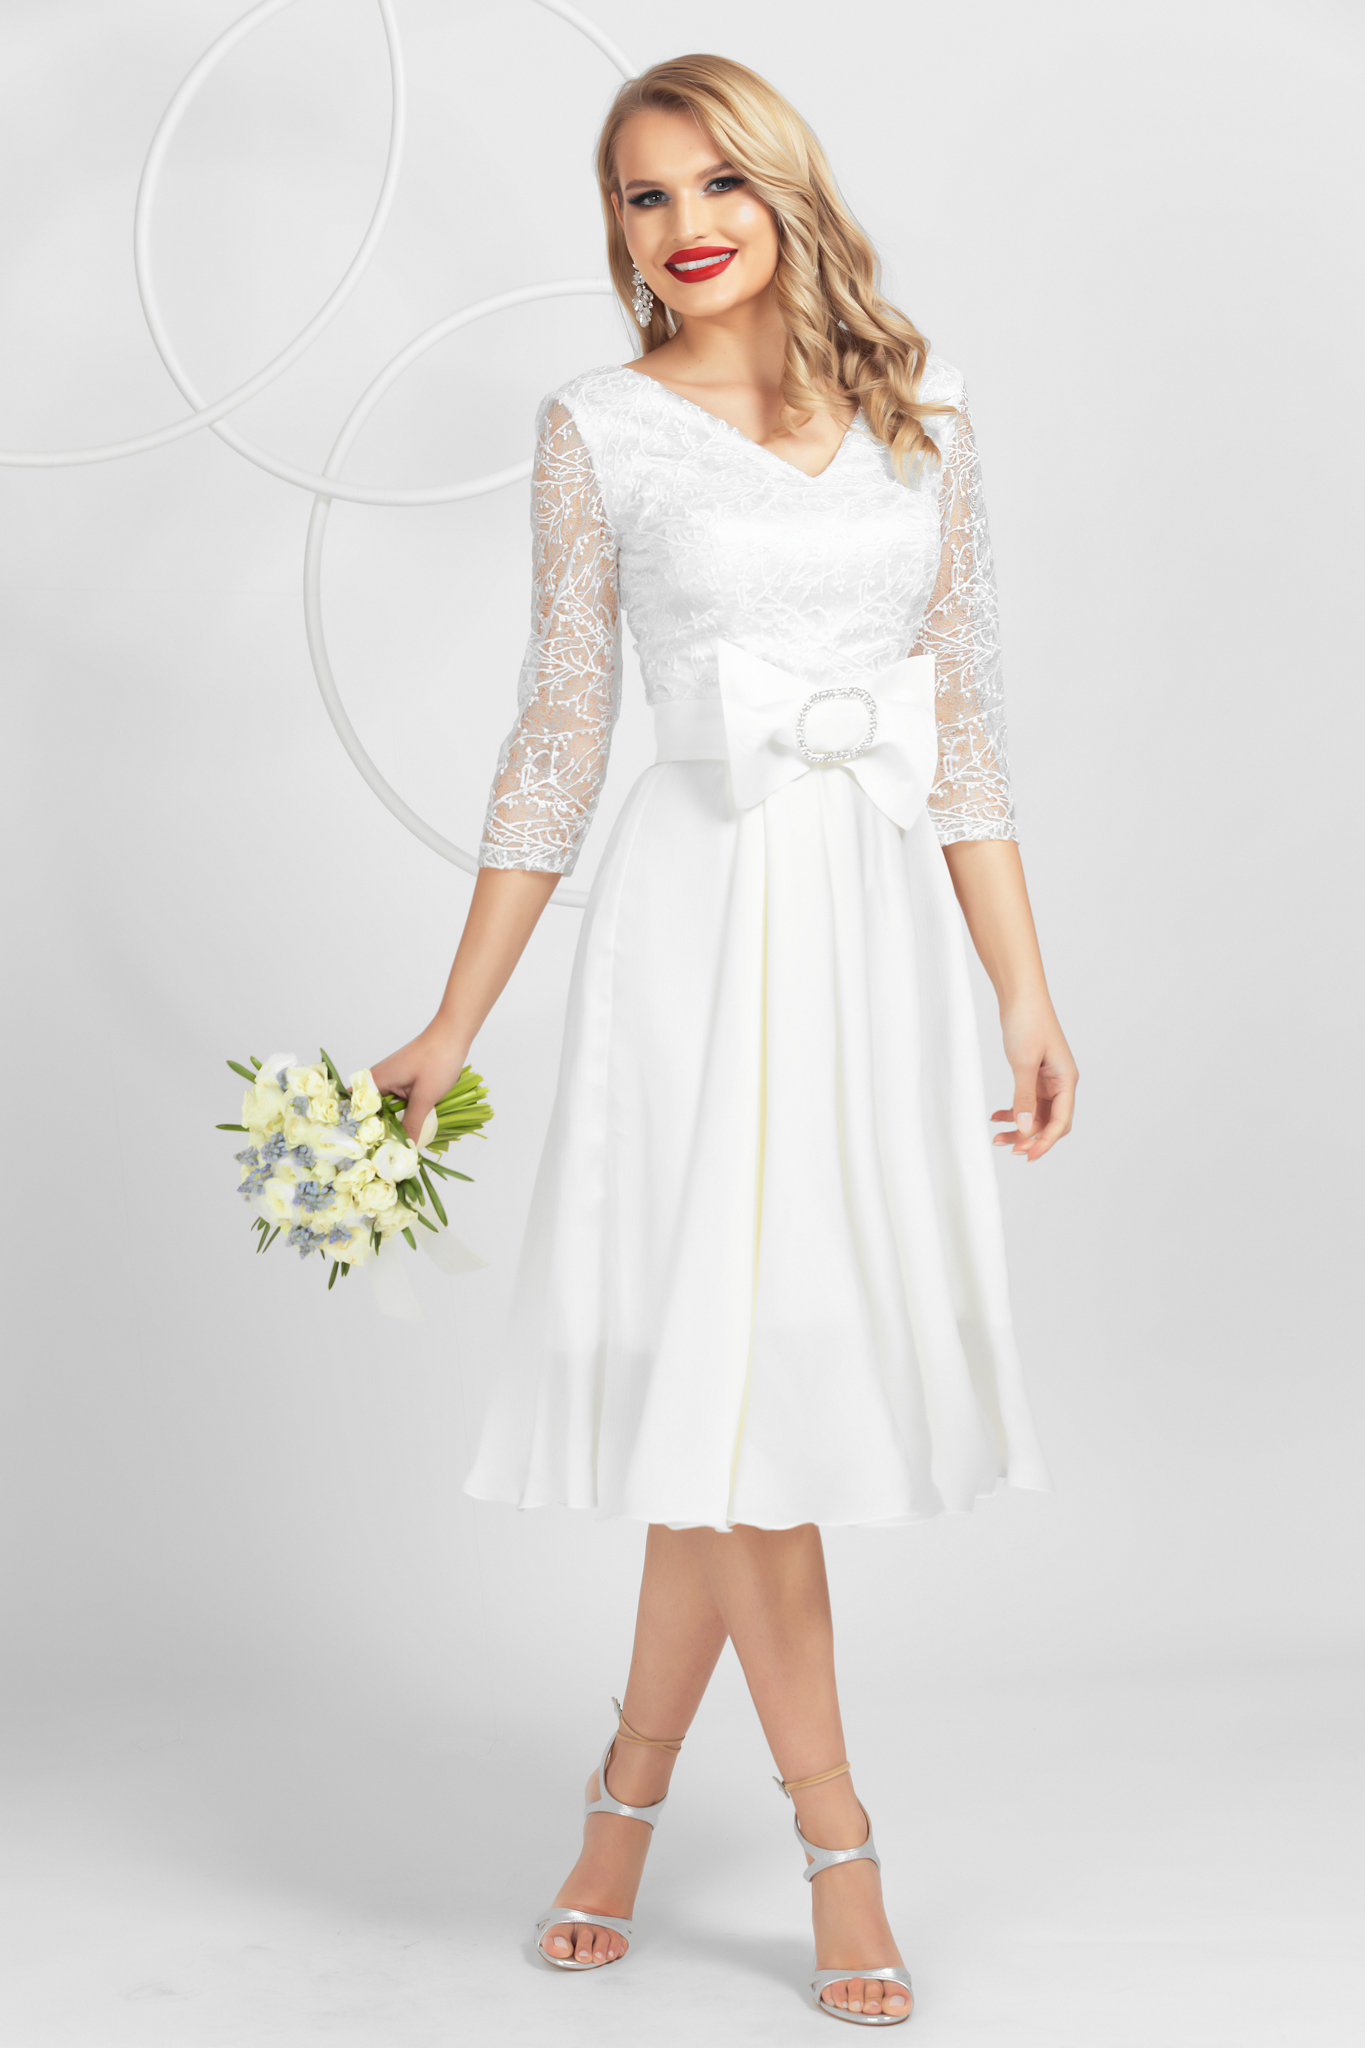 White from satin lace overlay dress elegant bow accessory genuine swarovski crystals